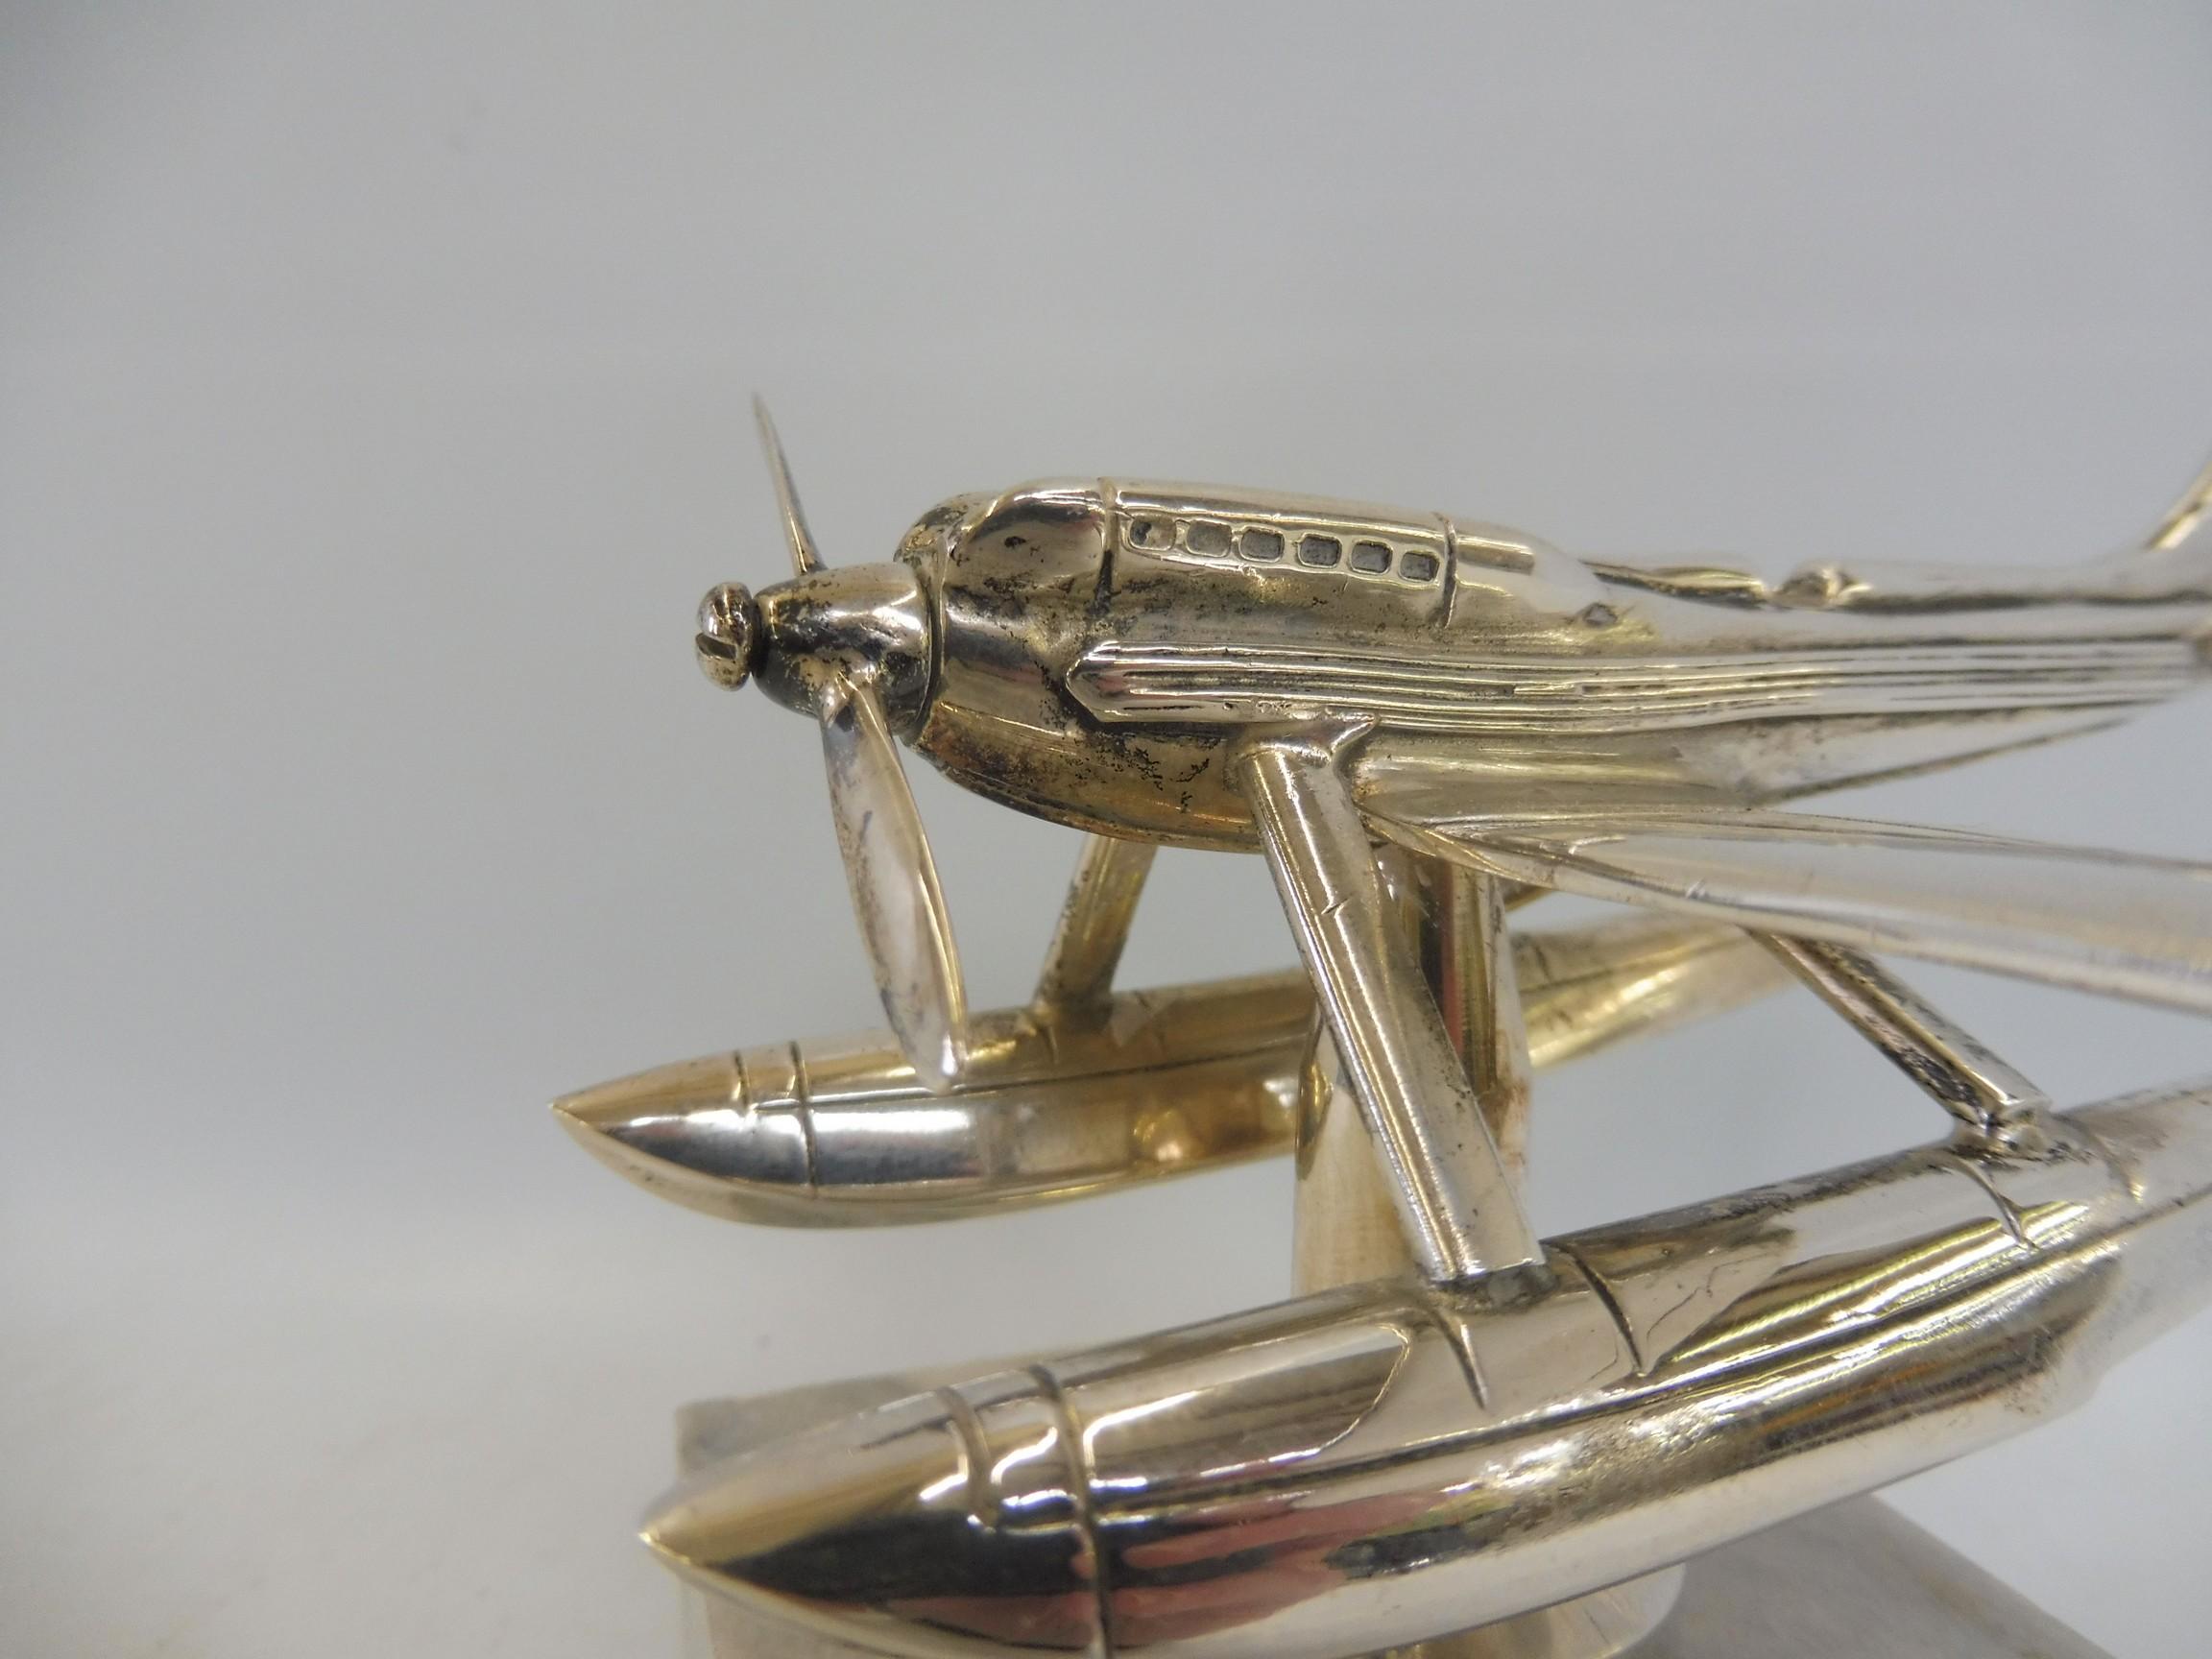 A Schneider Trophy seaplane supermarine mascot, nickel plated, inscribed 'Rolls-Royce' under one - Image 2 of 6